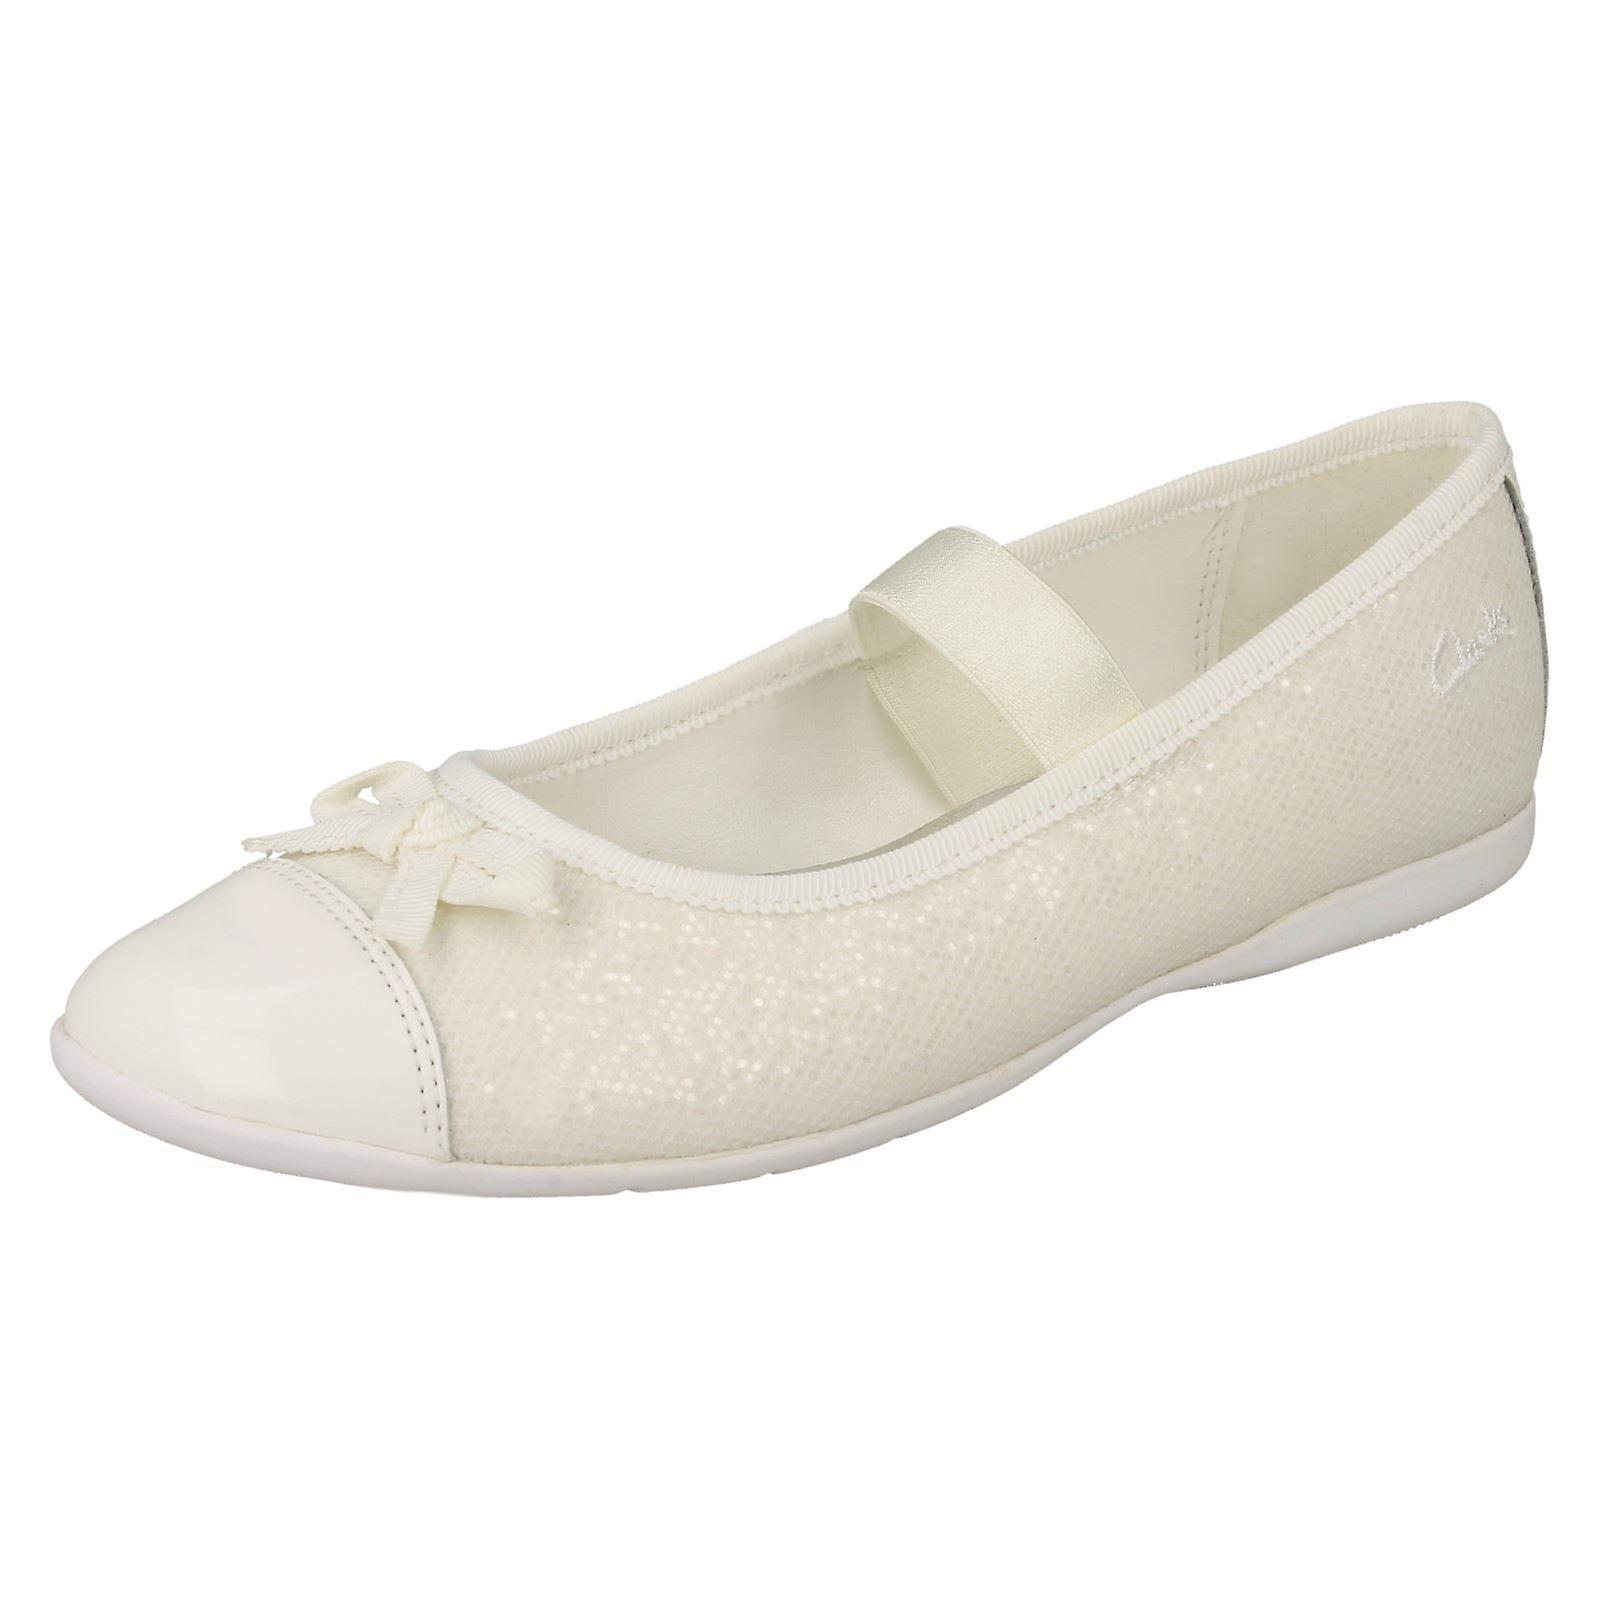 Clarks Girls Shoes Dance Sparkle